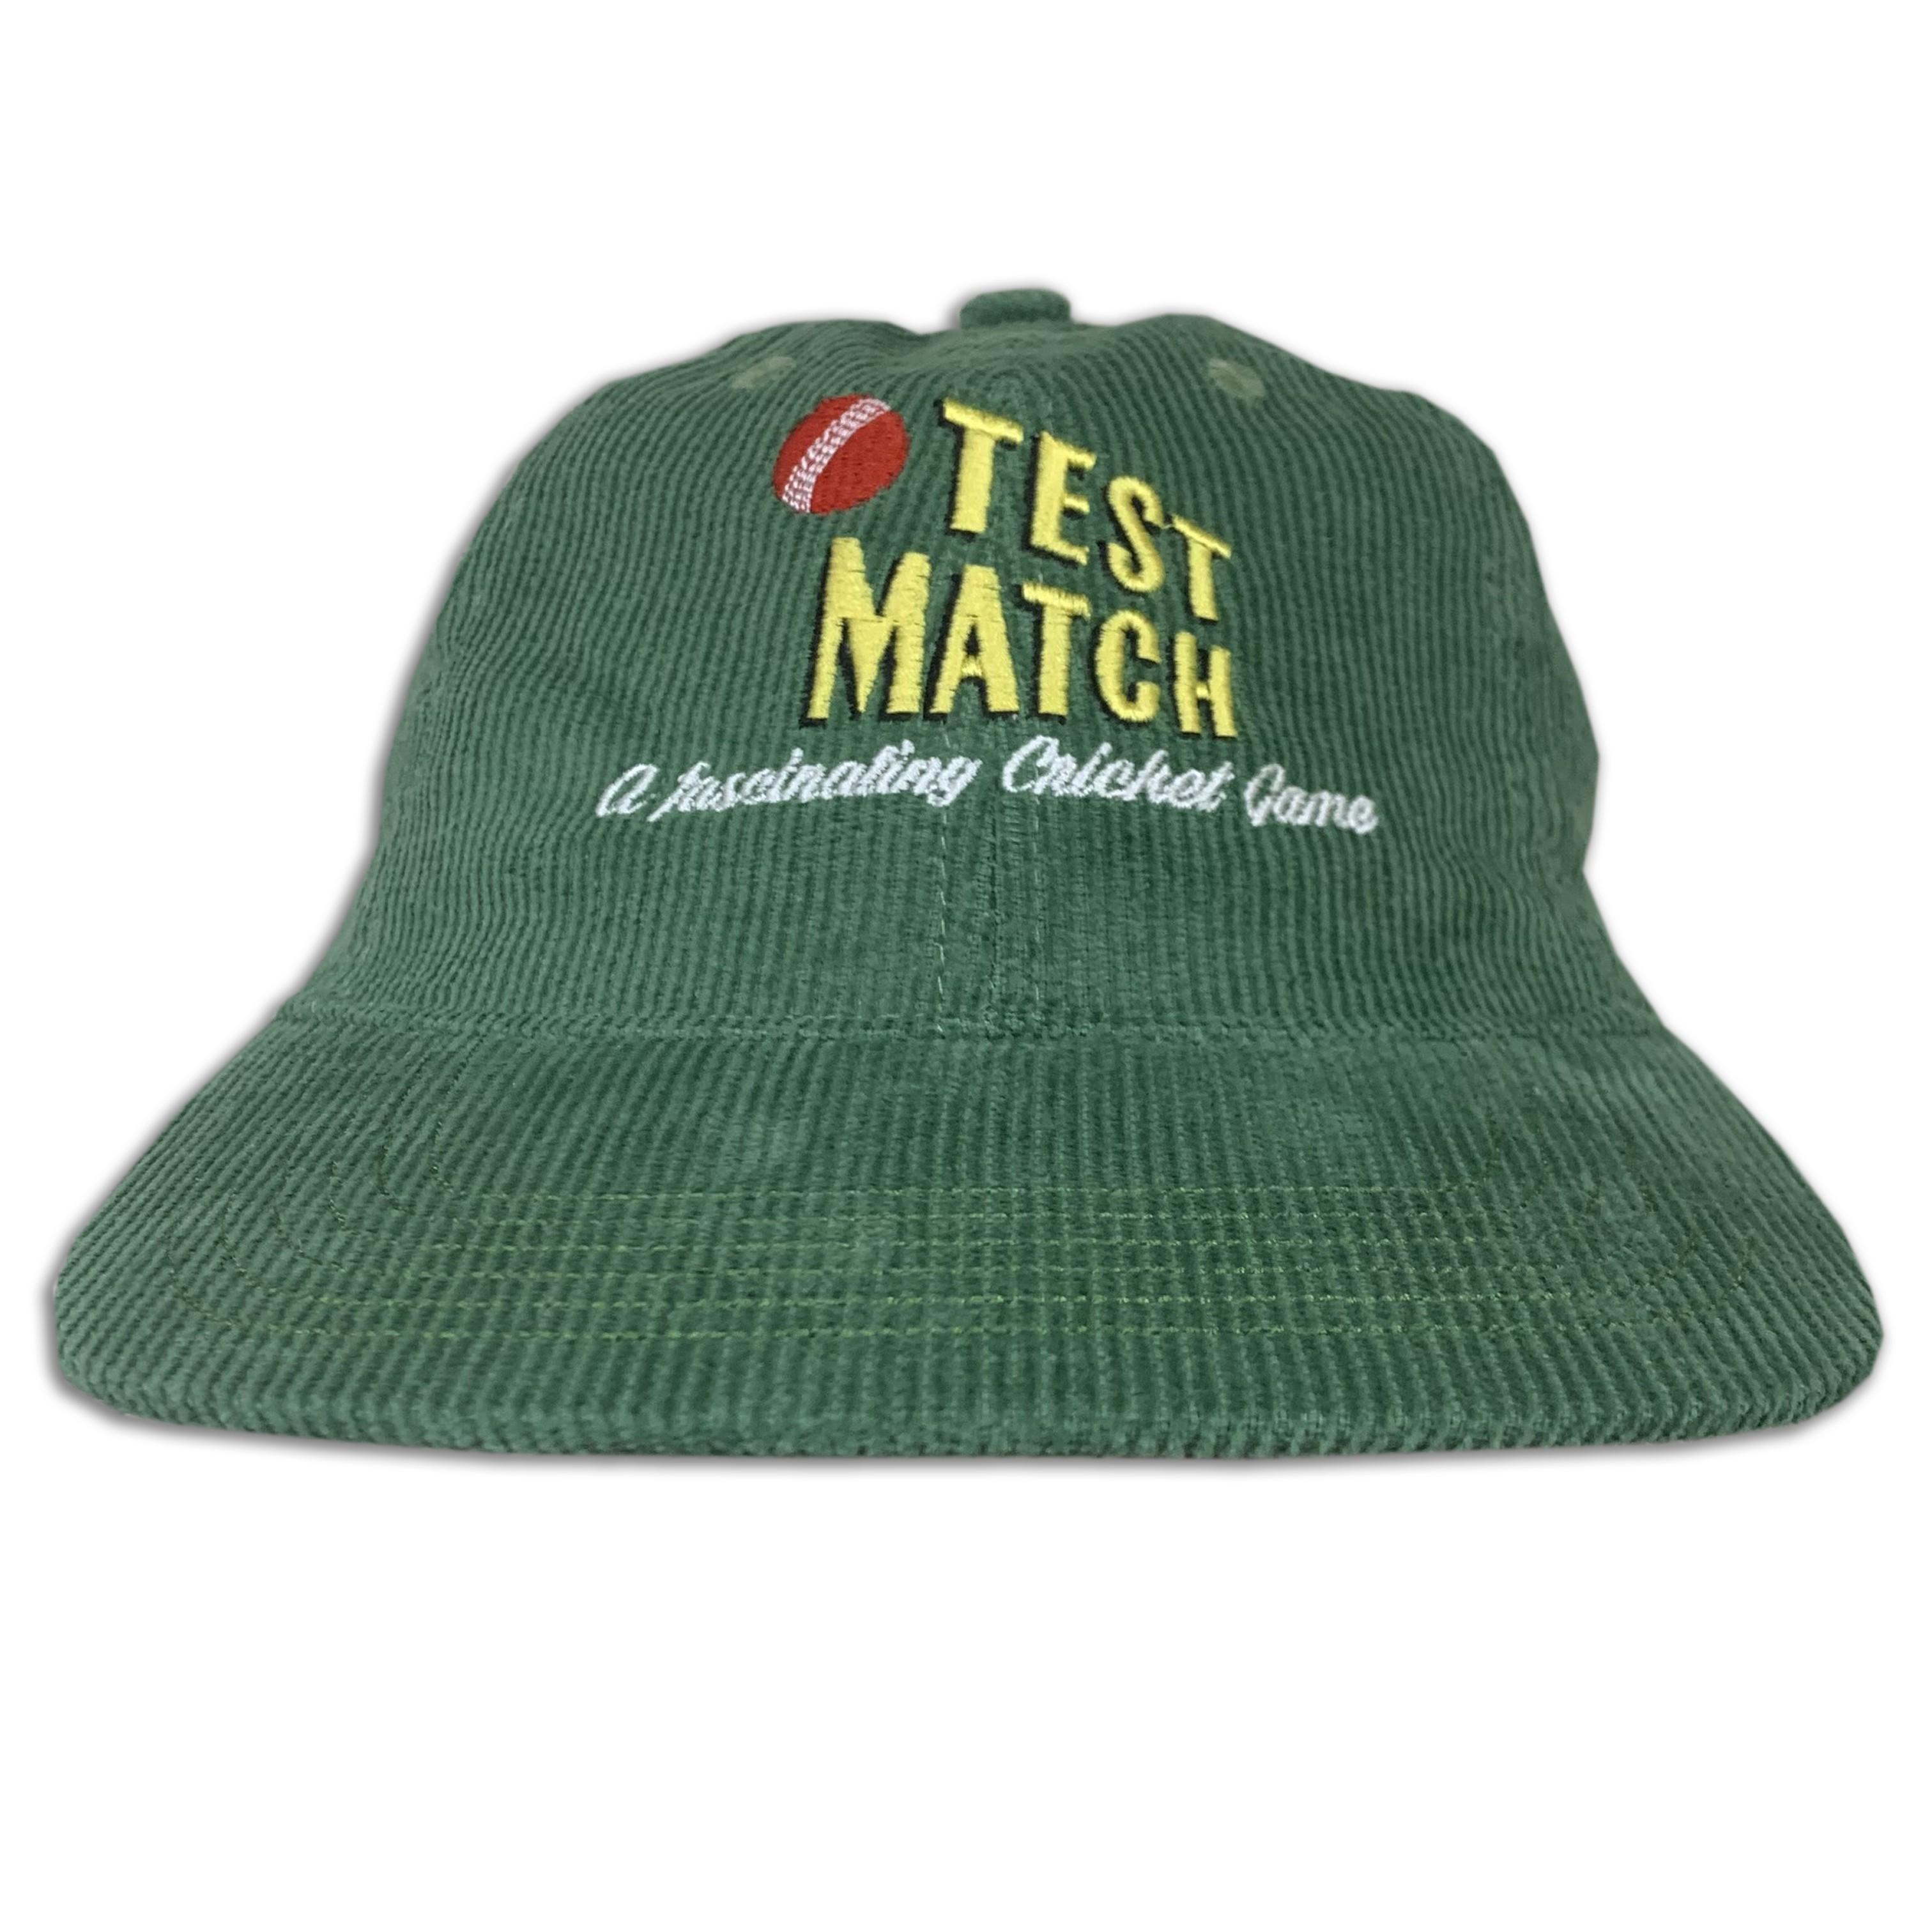 GREEN TEST MATCH VINTAGE CORD HAT